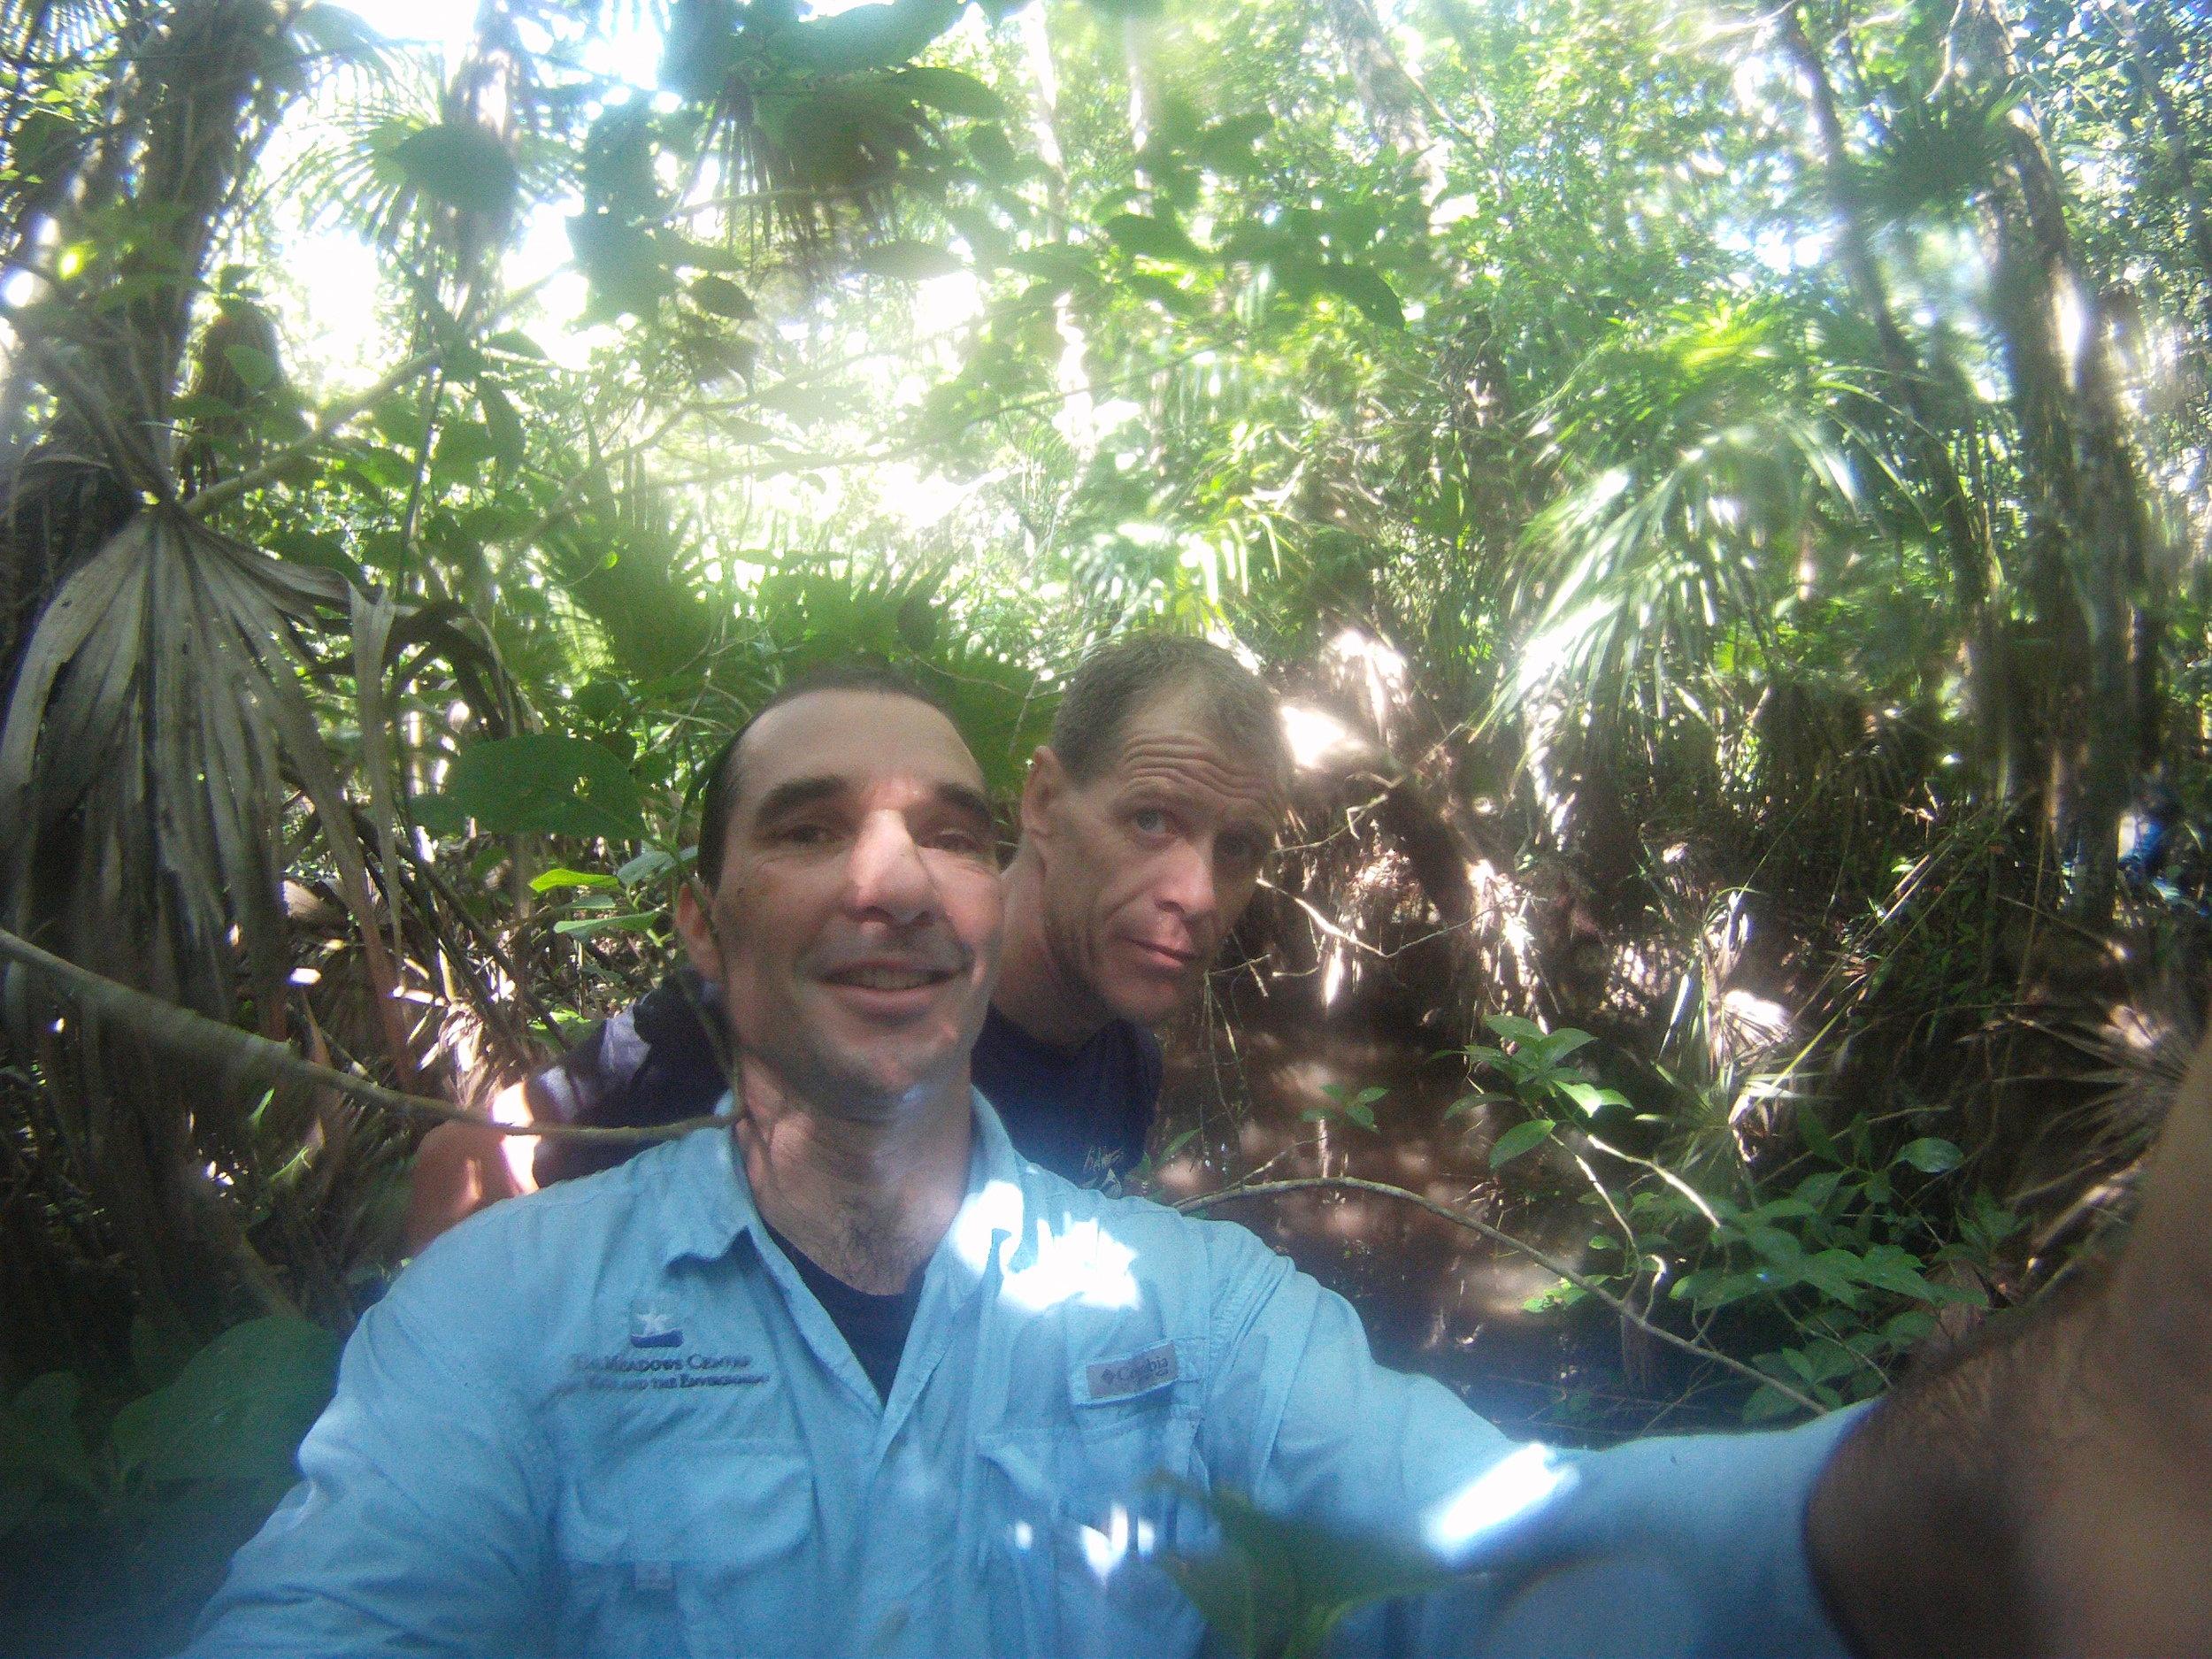 Sam and Christophe finding Cenote Doblado, 2013